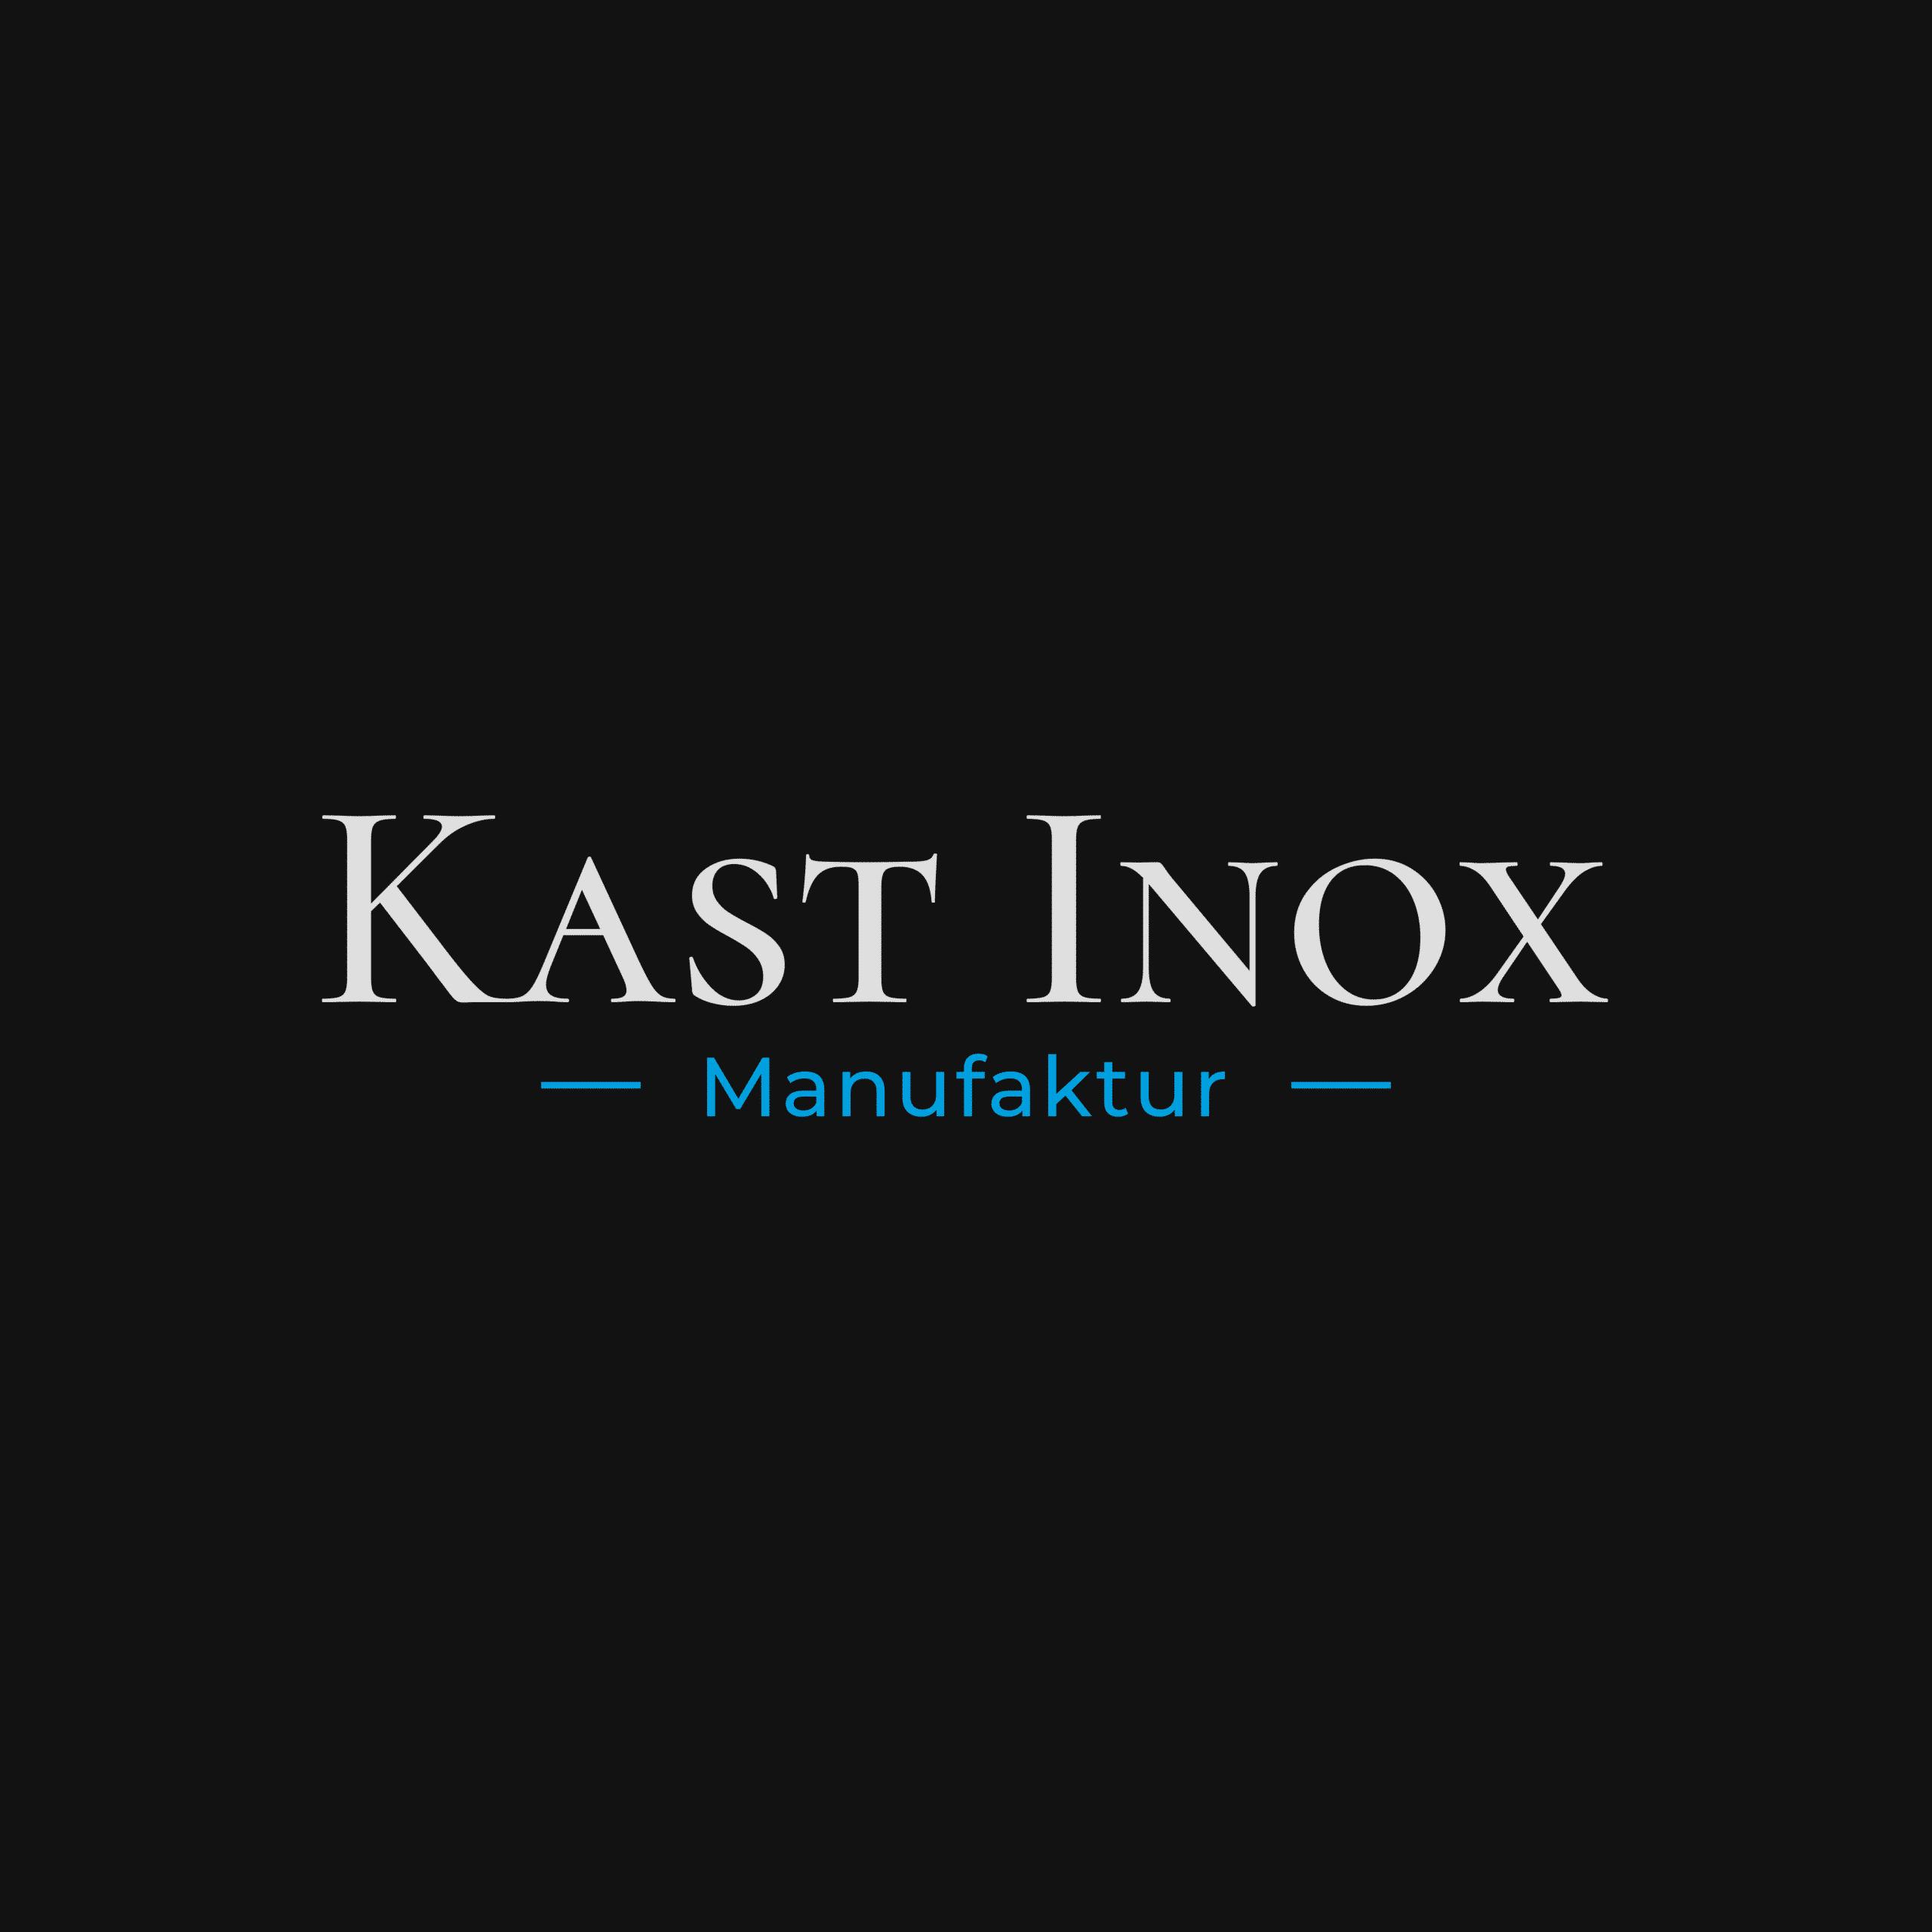 kast-inox-manufaktor-verzinken